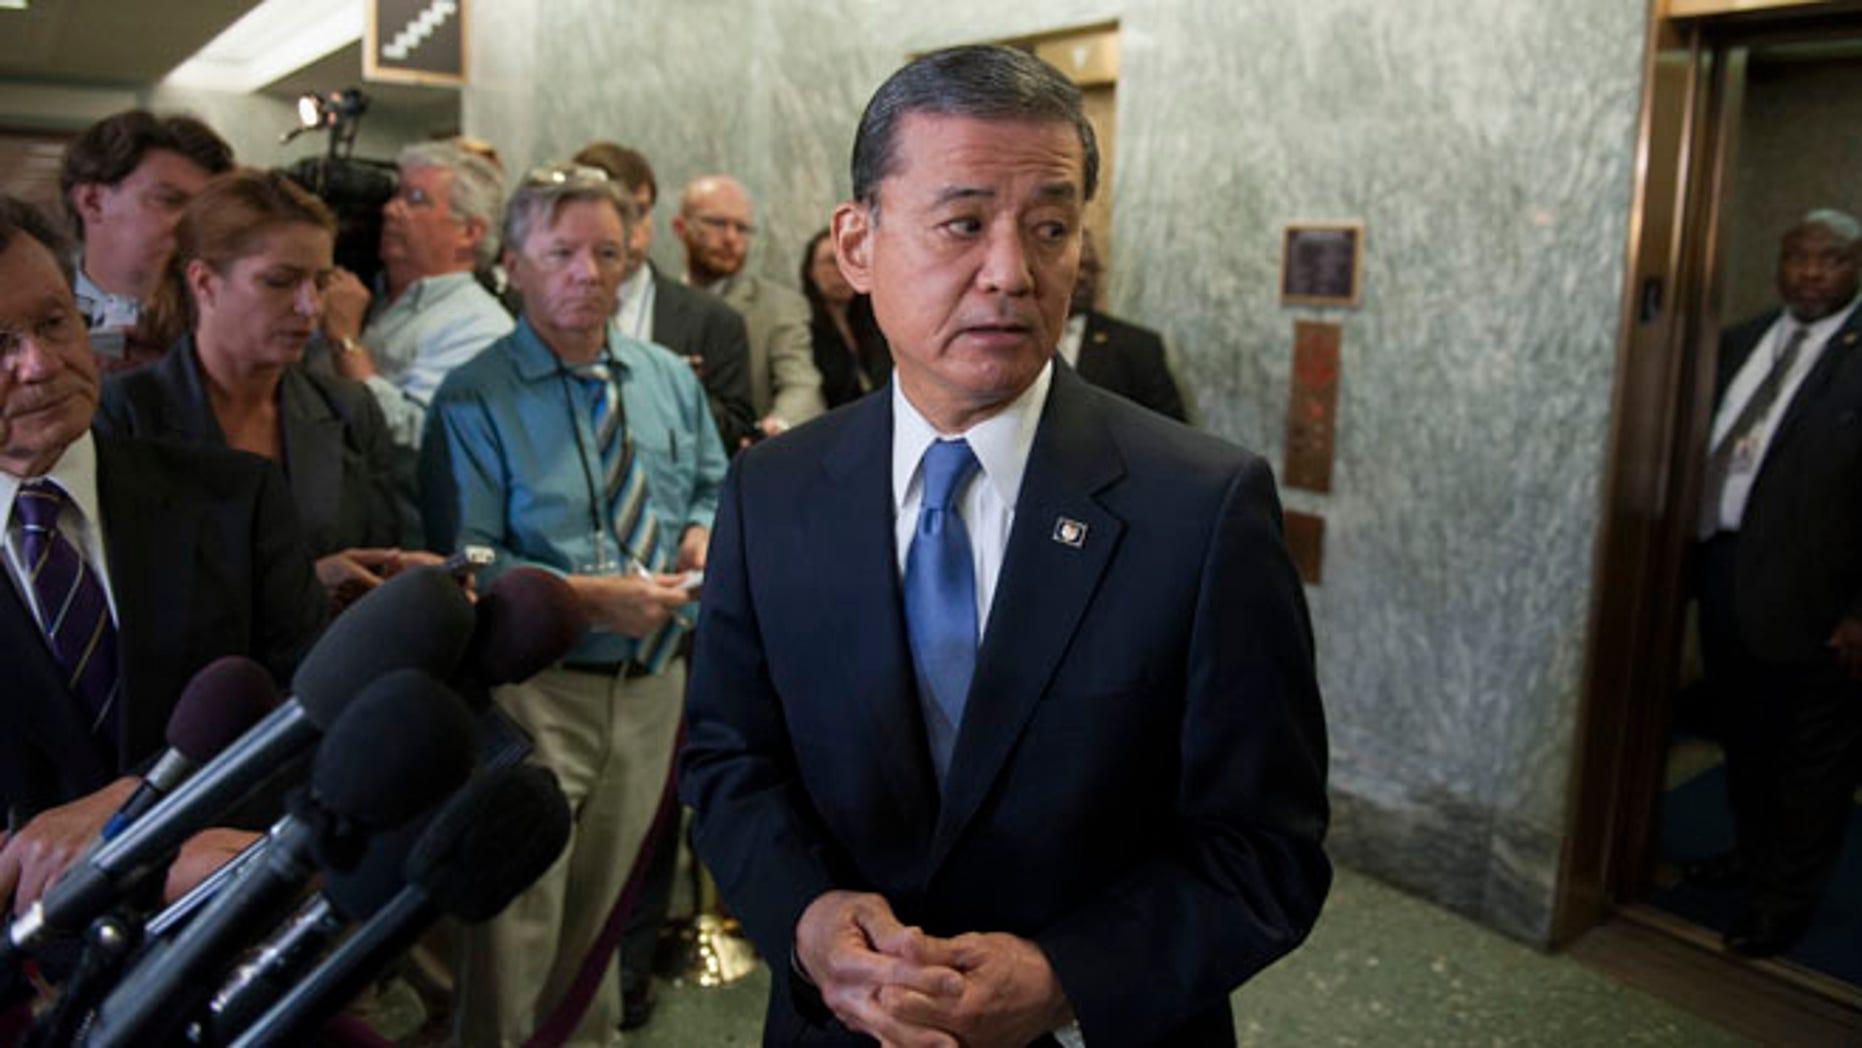 Veterans Affairs Secretary Eric Shinseki on Capitol Hill in Washington, Thursday, May 15, 2014.